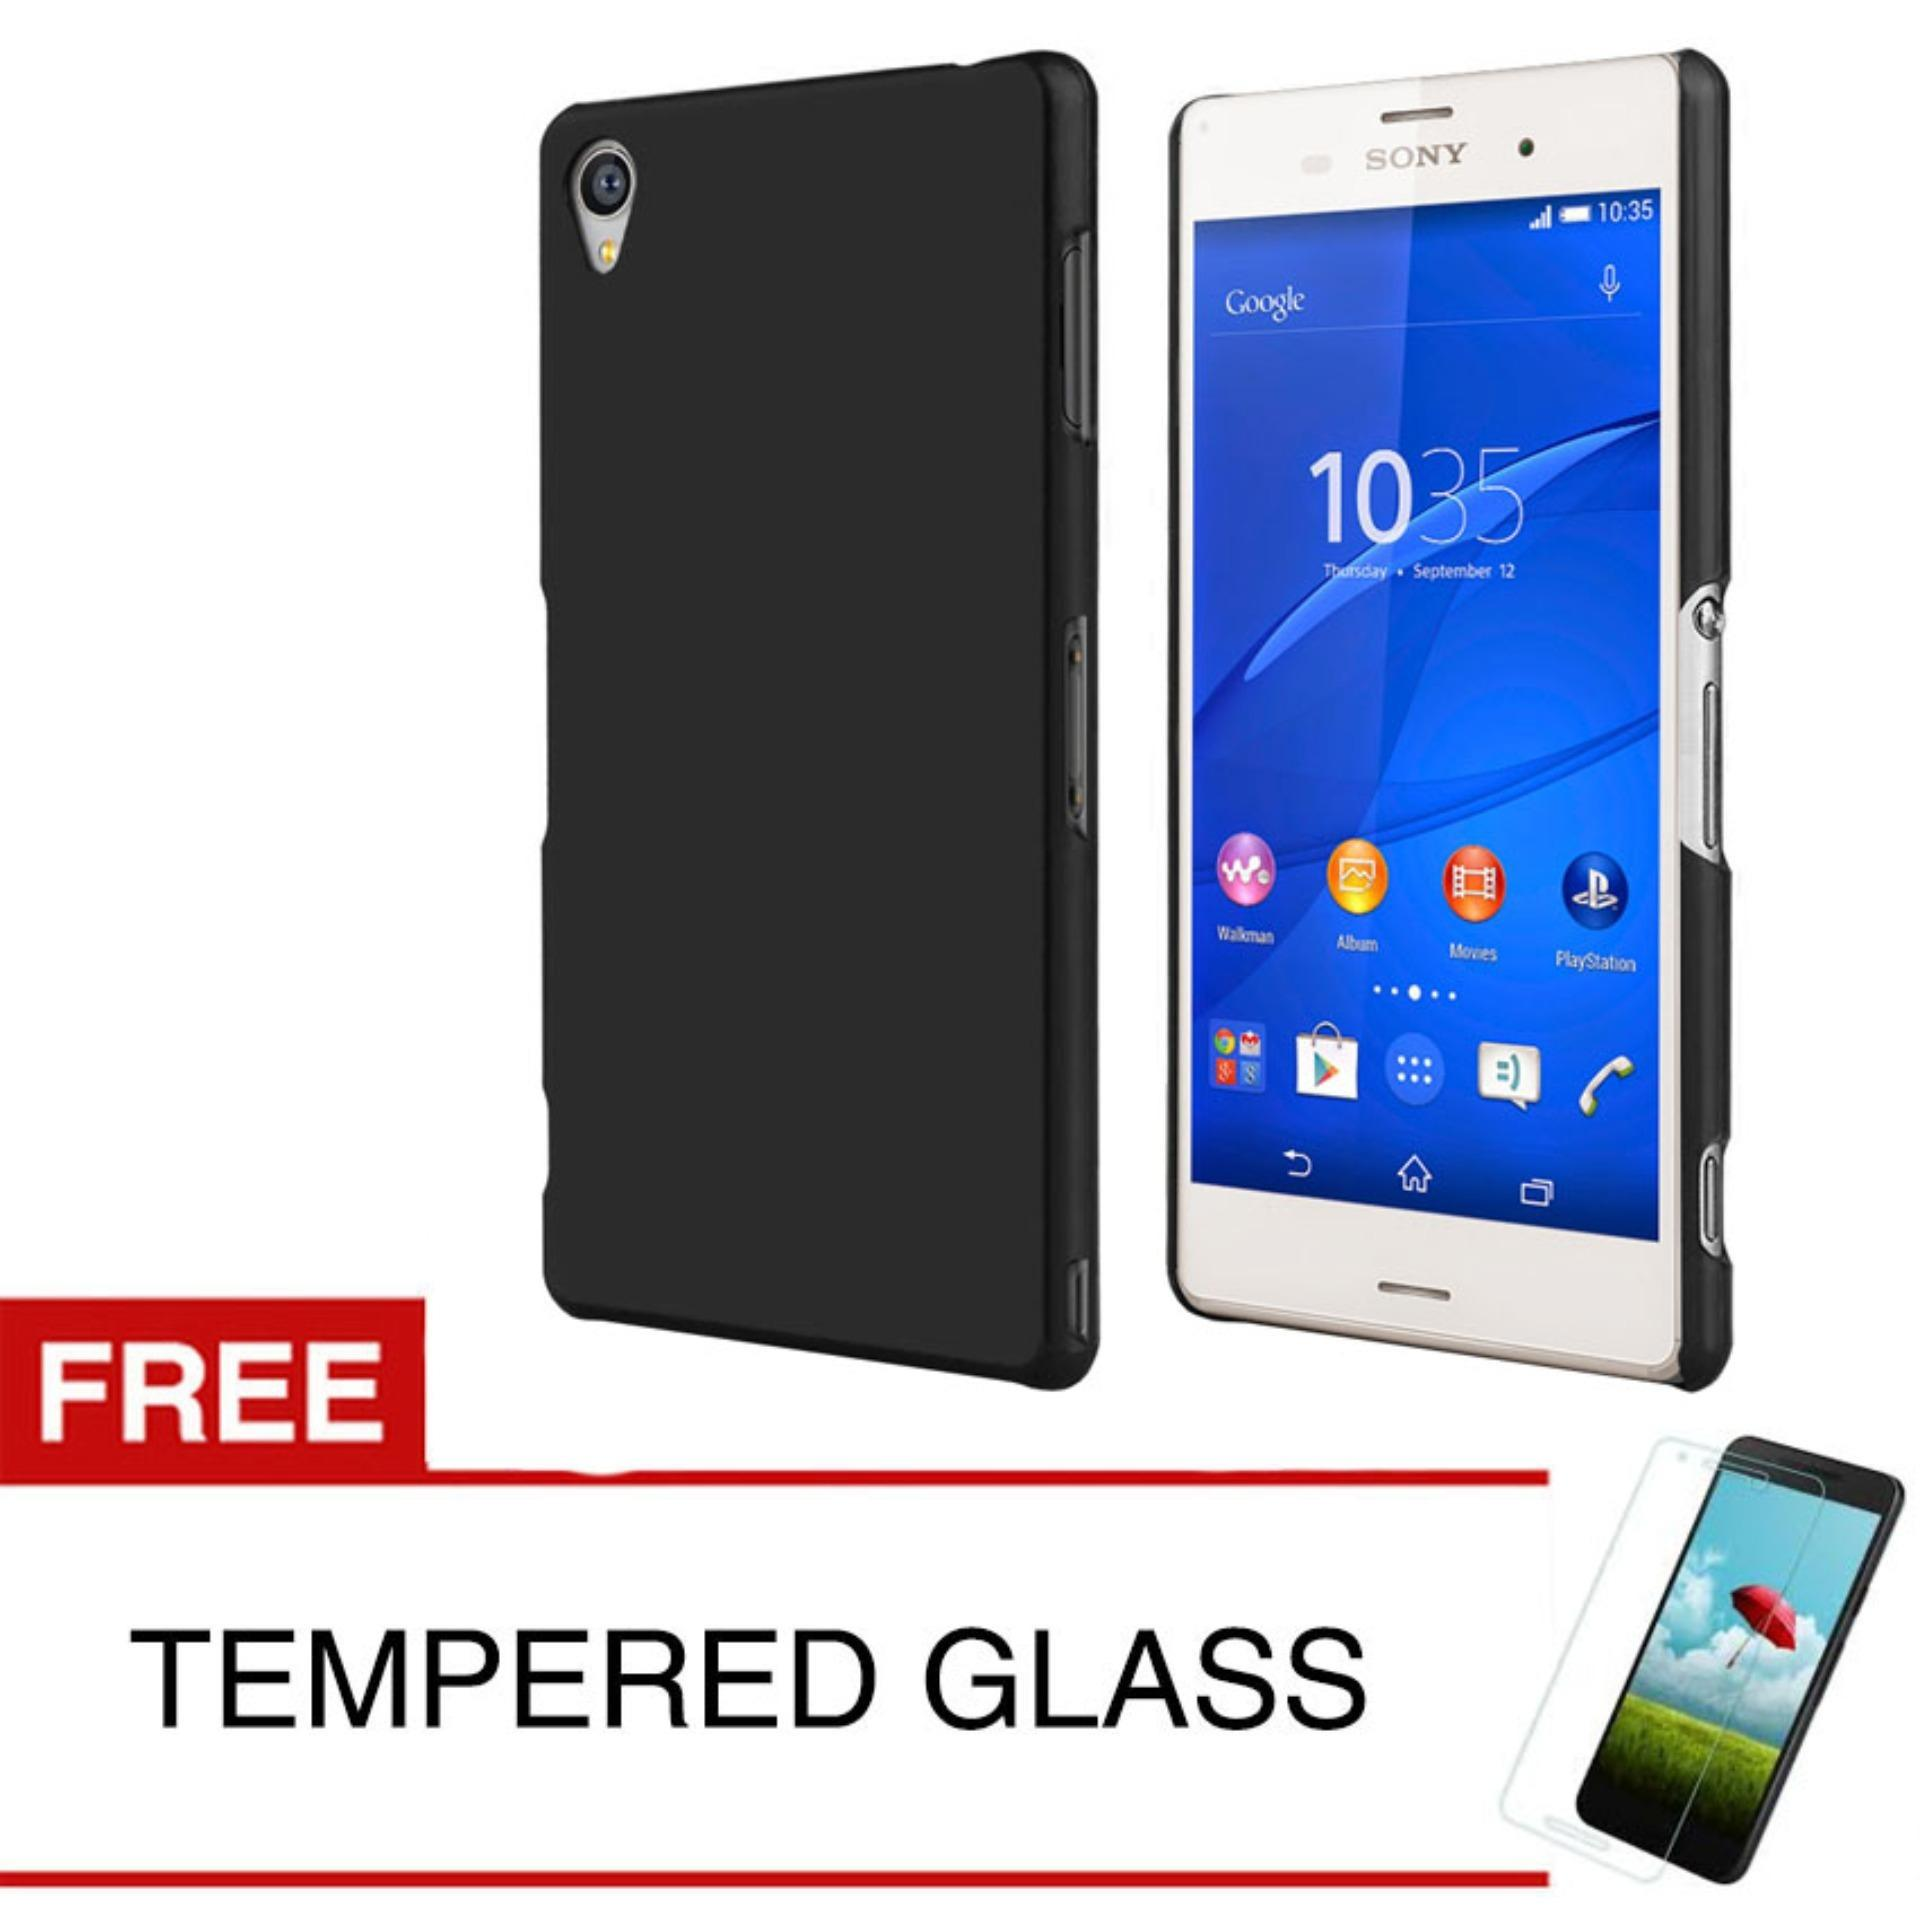 Case Slim Black Matte Sony Xperia Z3 - Black Doff - Free Tempered Glass